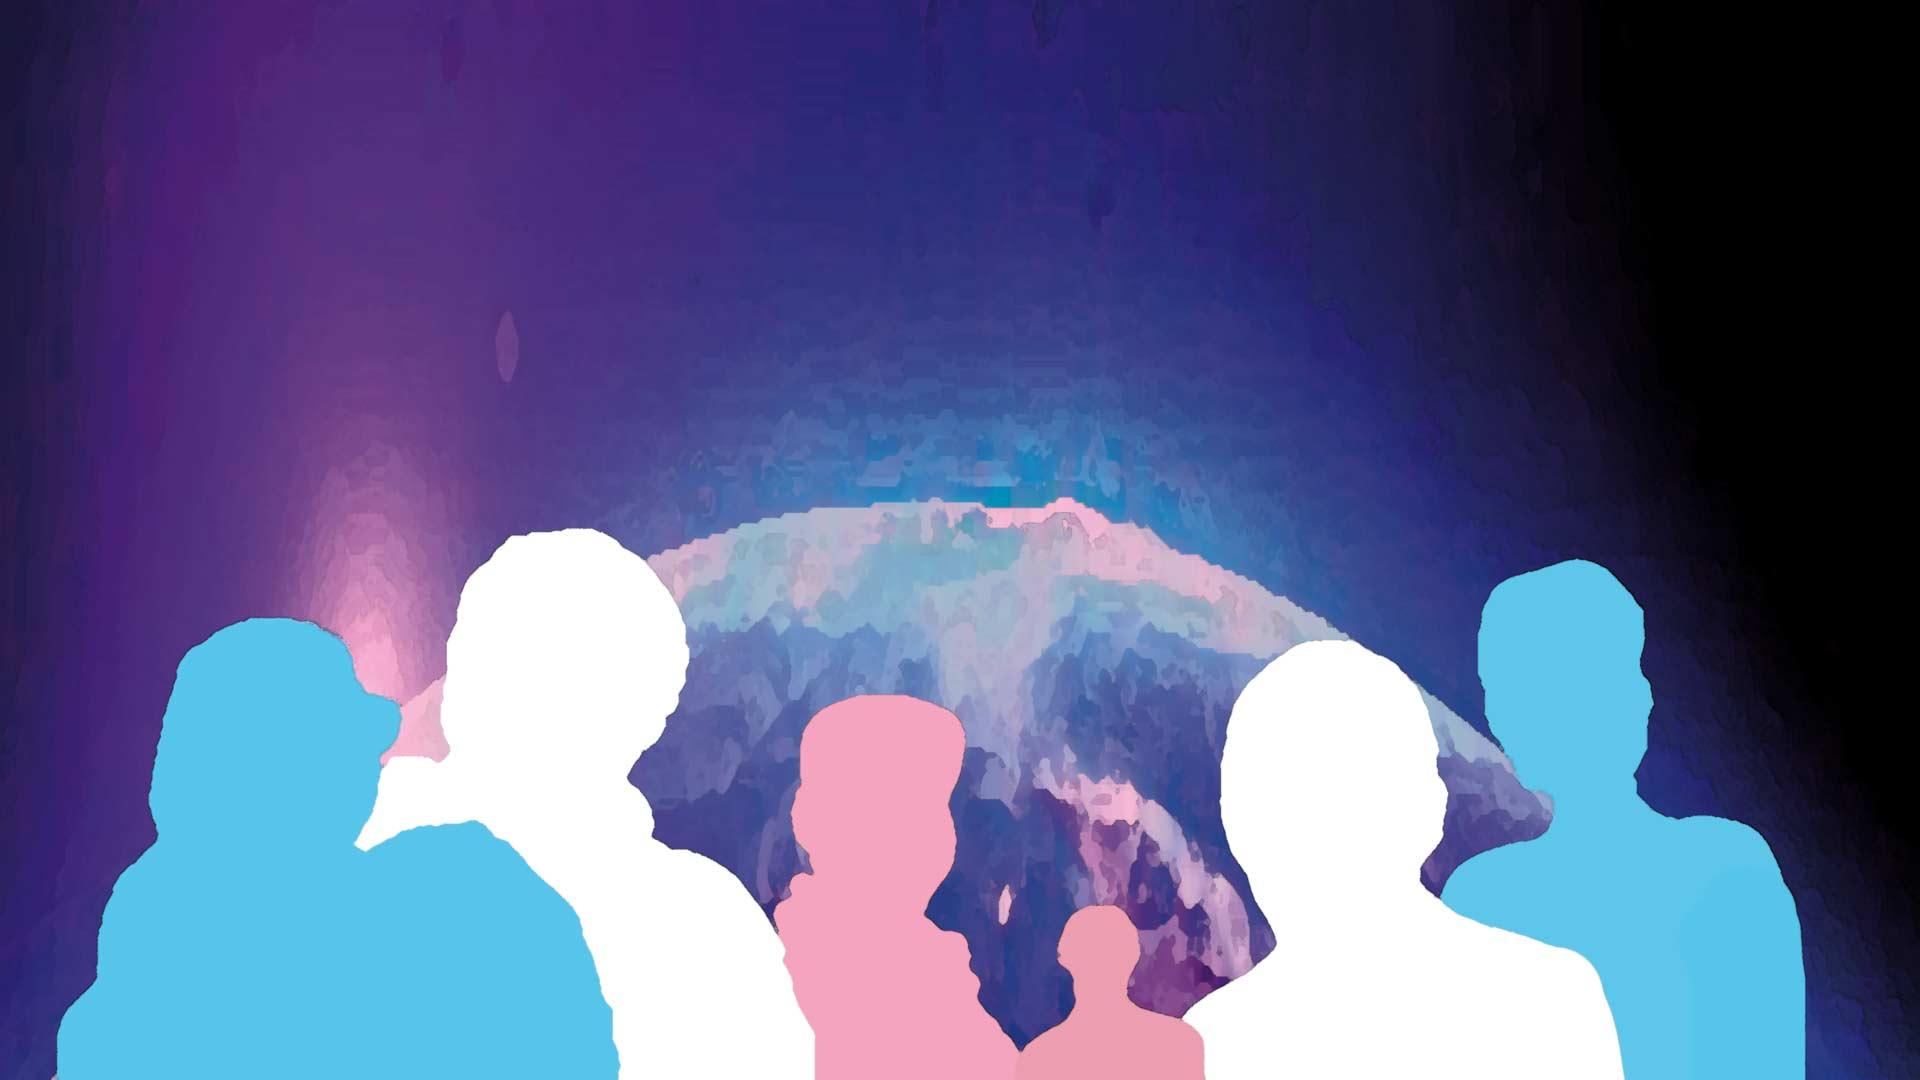 Hatmotivert vold mot transpersoner: 3664 mord i verden og hver femte transperson i Sverige utsatt for fysisk vold. Hatkrimlovgivningen i Norge kom ikke et sekund for sent.